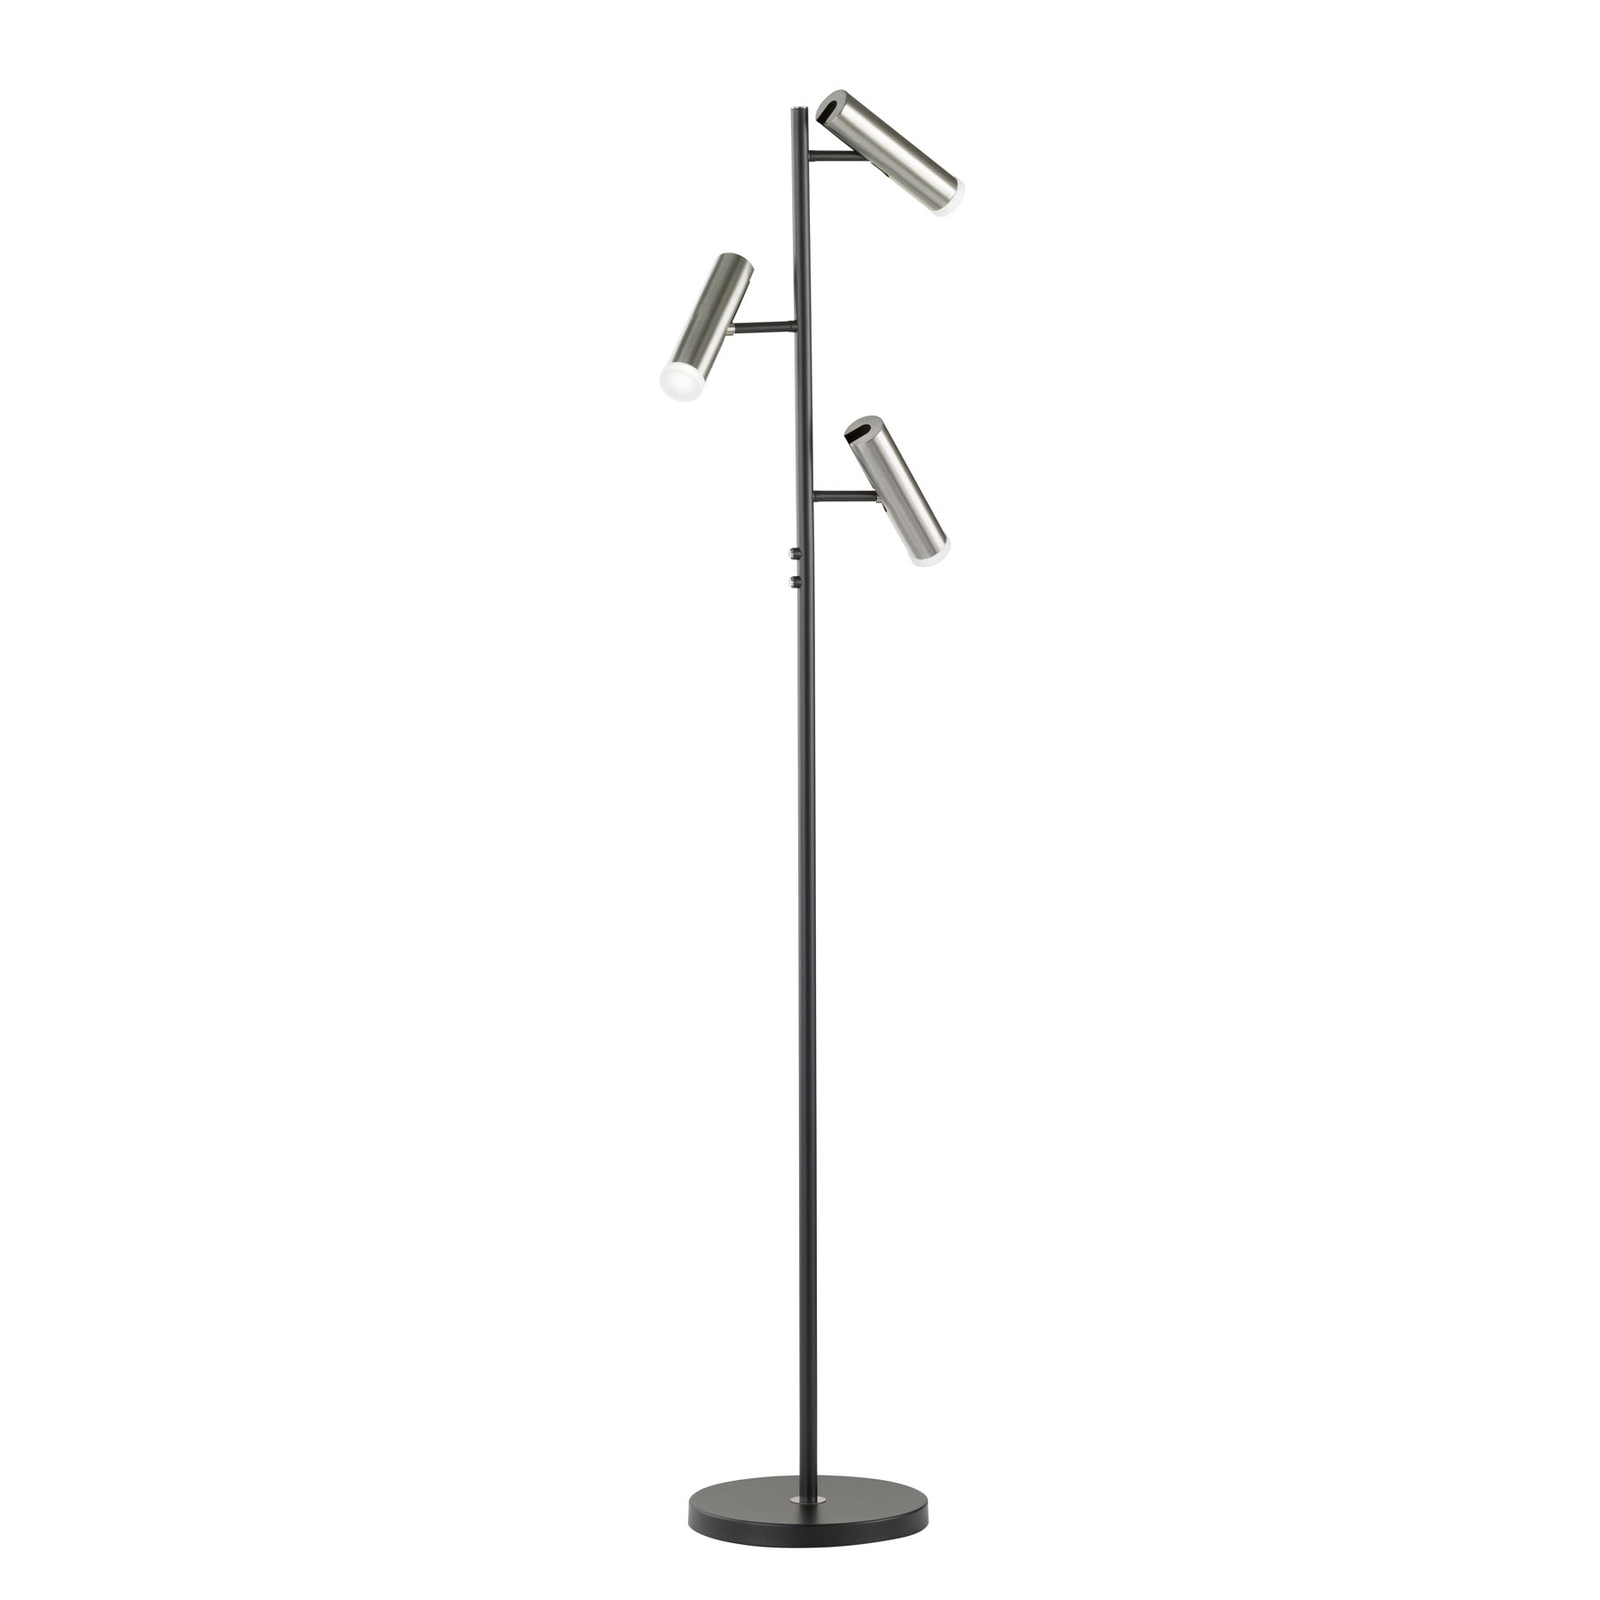 LED-golvlampa Z-Ronja 3 lampor, ZigBee-redo